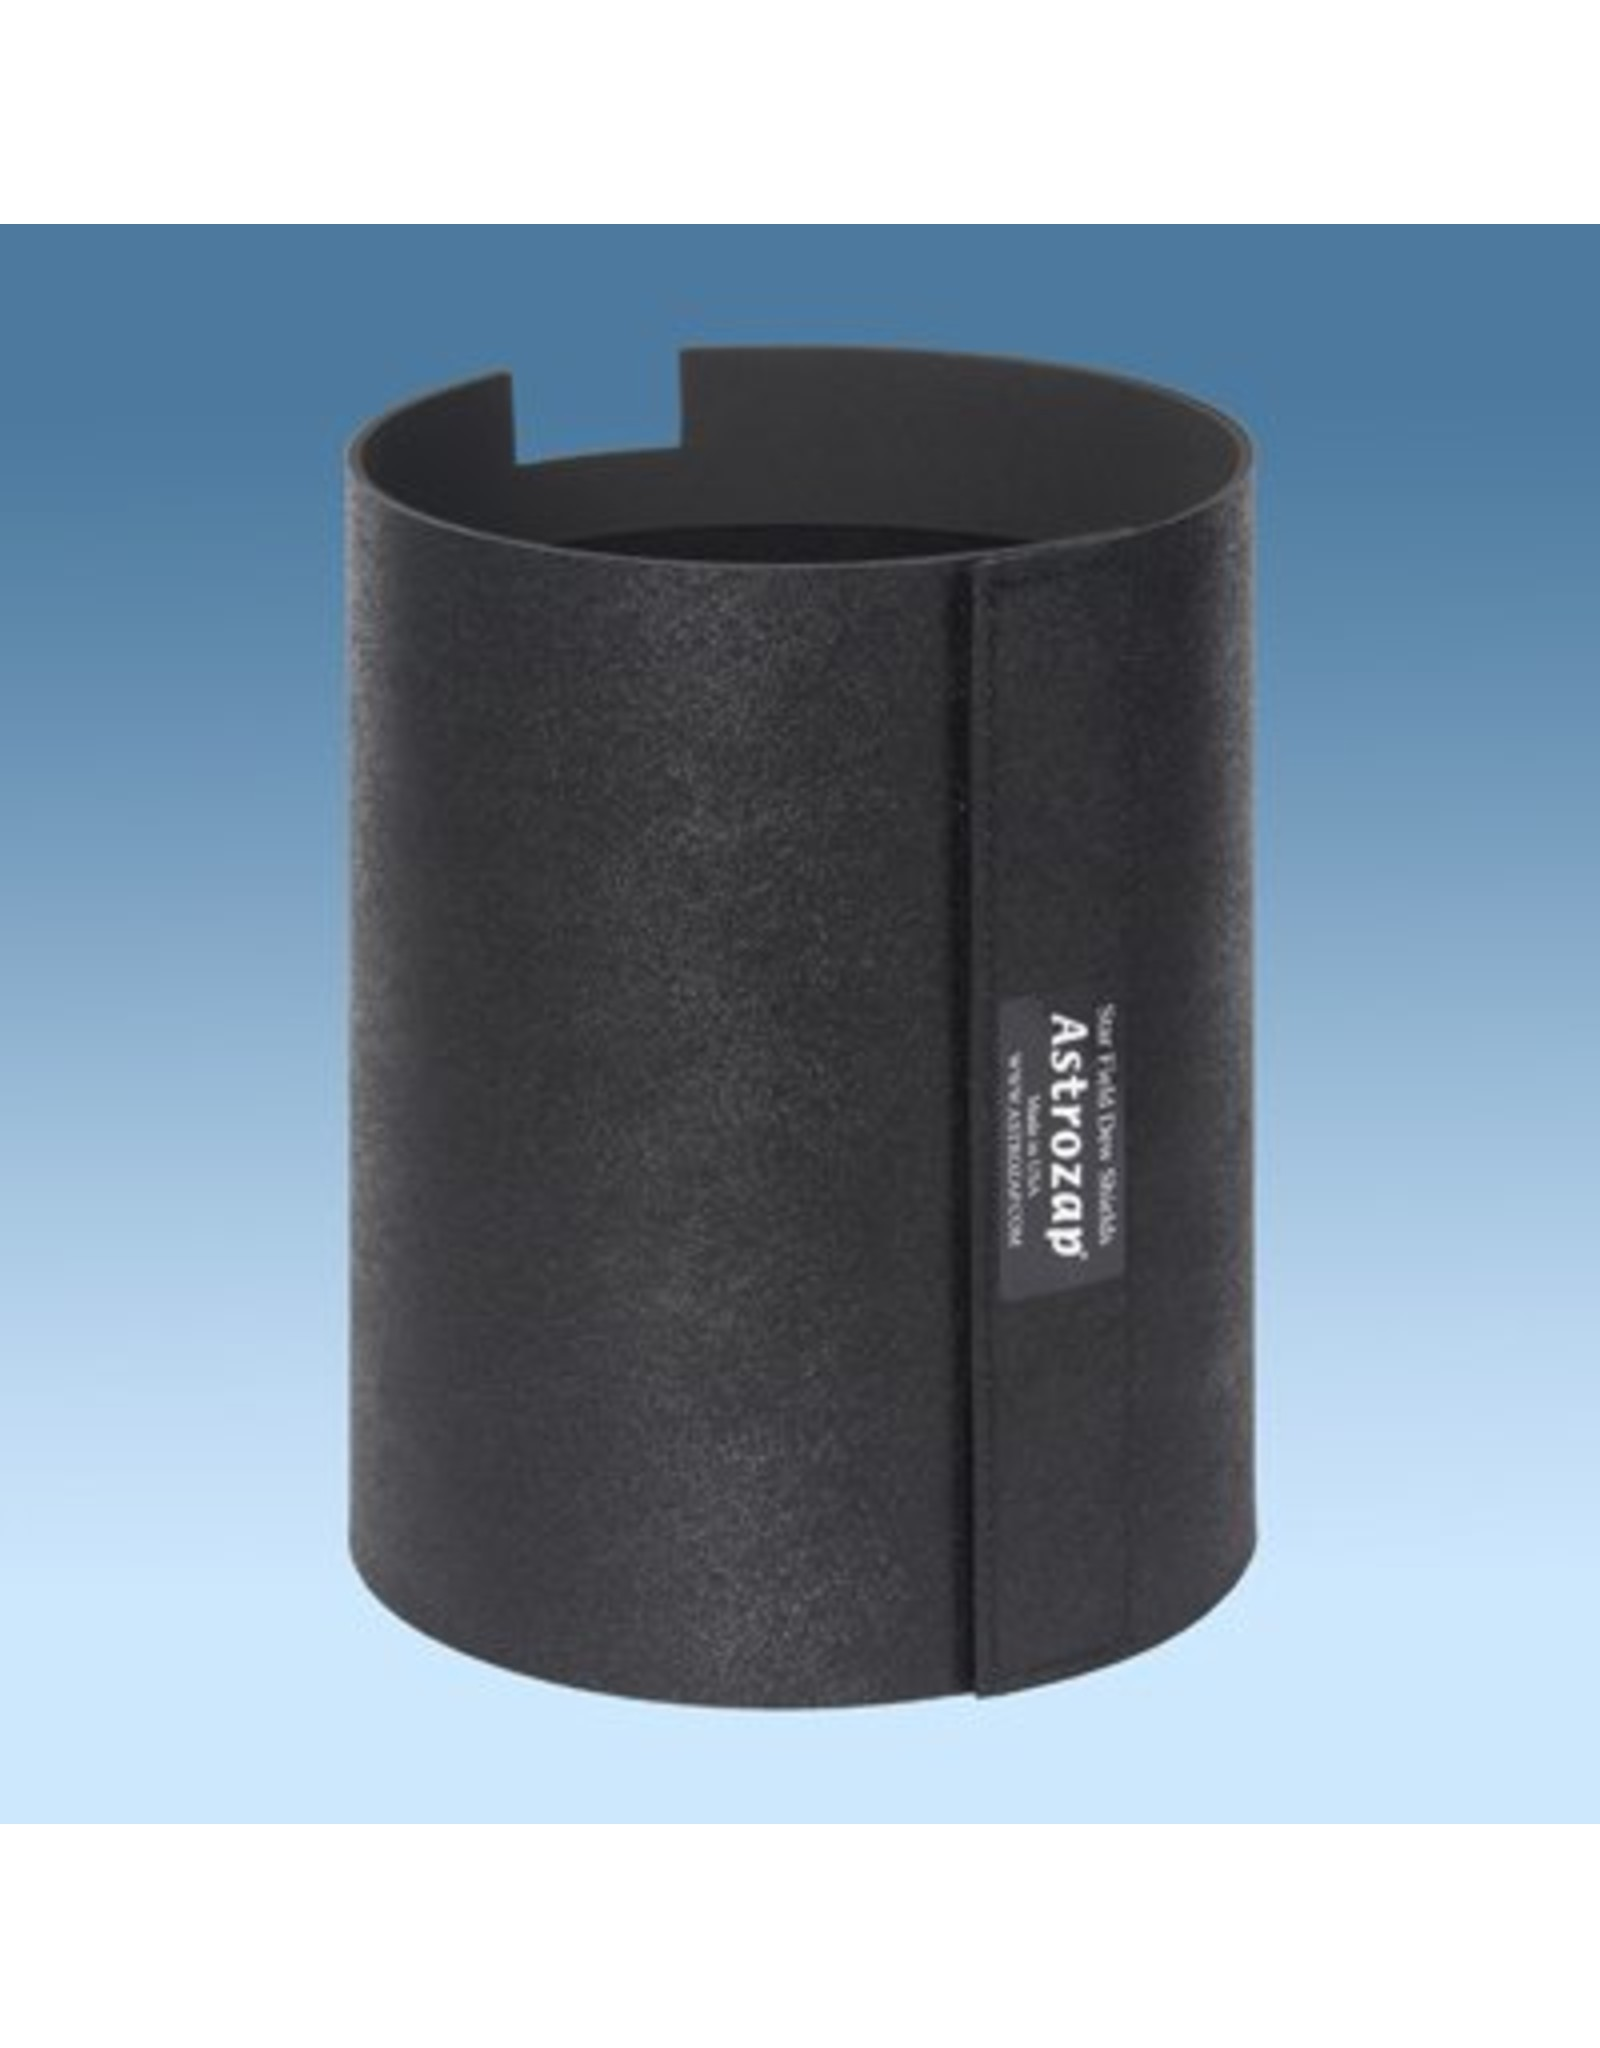 Astrozap Celestron 14 SCT Flexi-Shield™ Flexible Dew Shield - No Notch